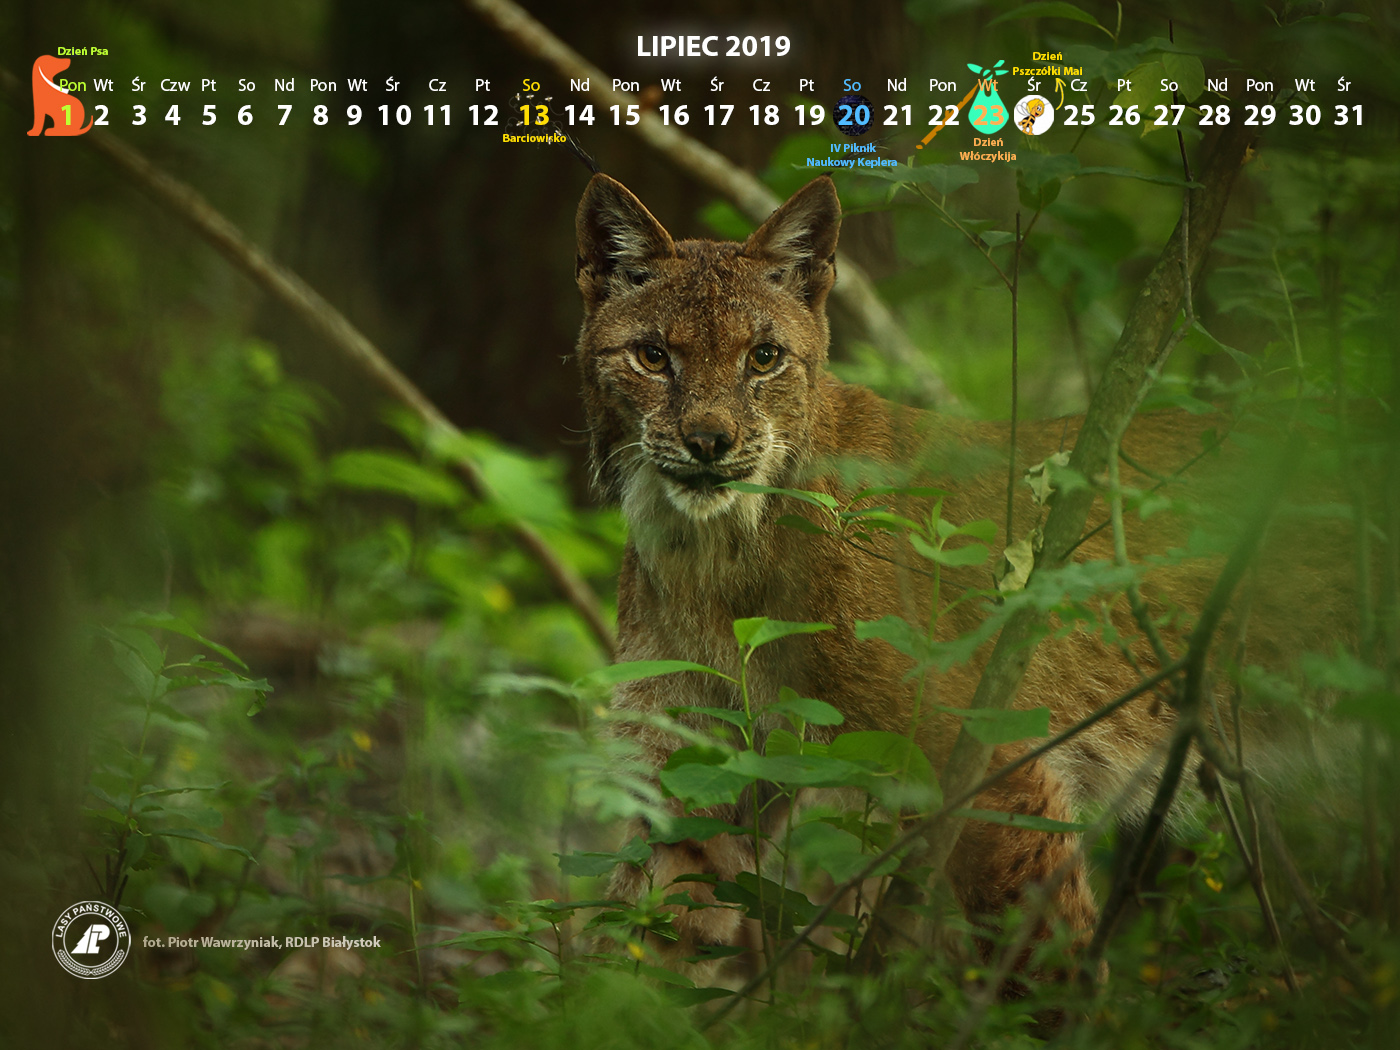 Kalendarz_lipiec2019_1400x1050[1].jpg